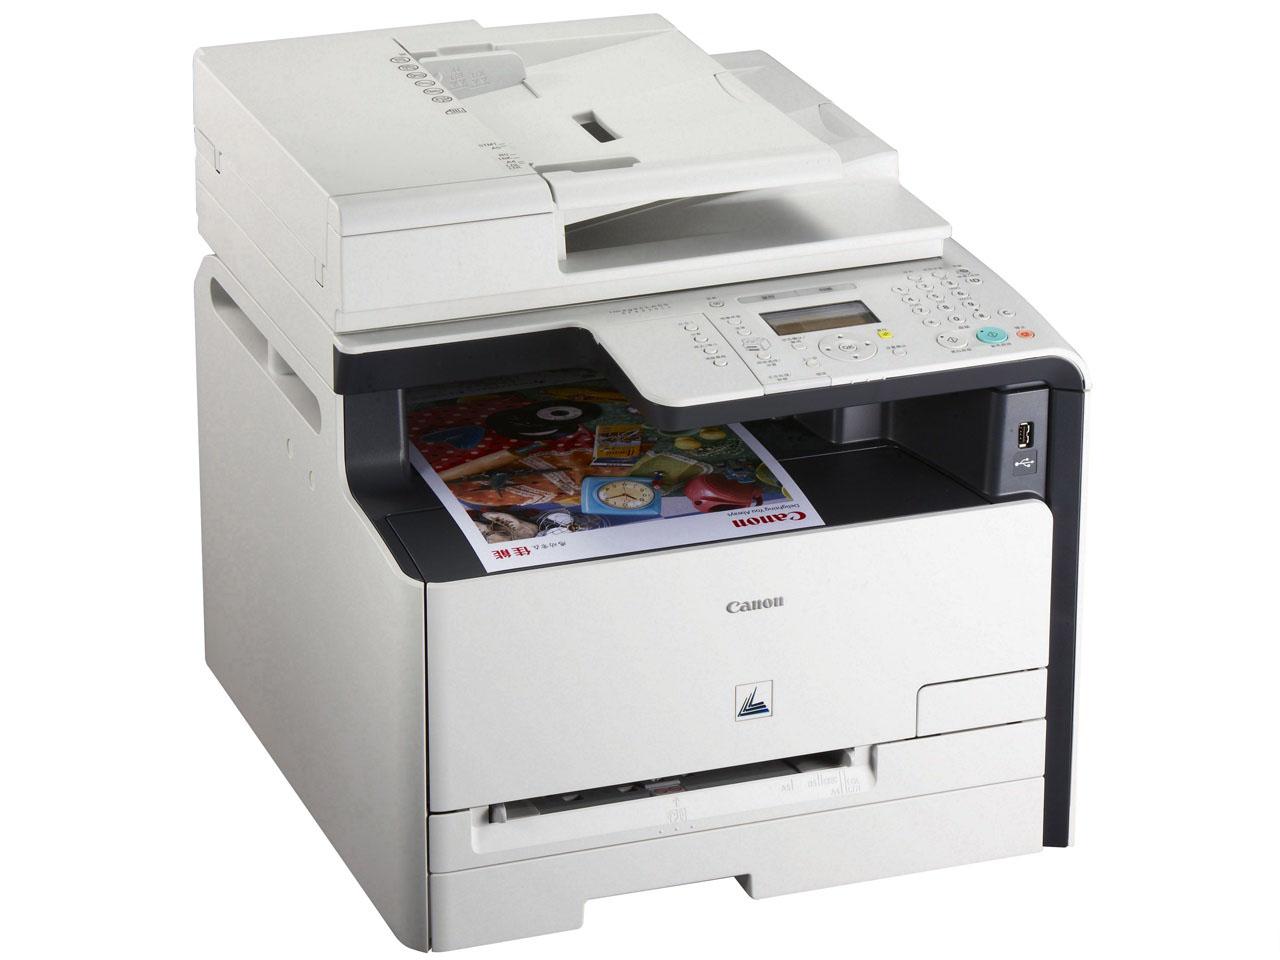 Принтер Canon i-SENSYS MF8050Cn